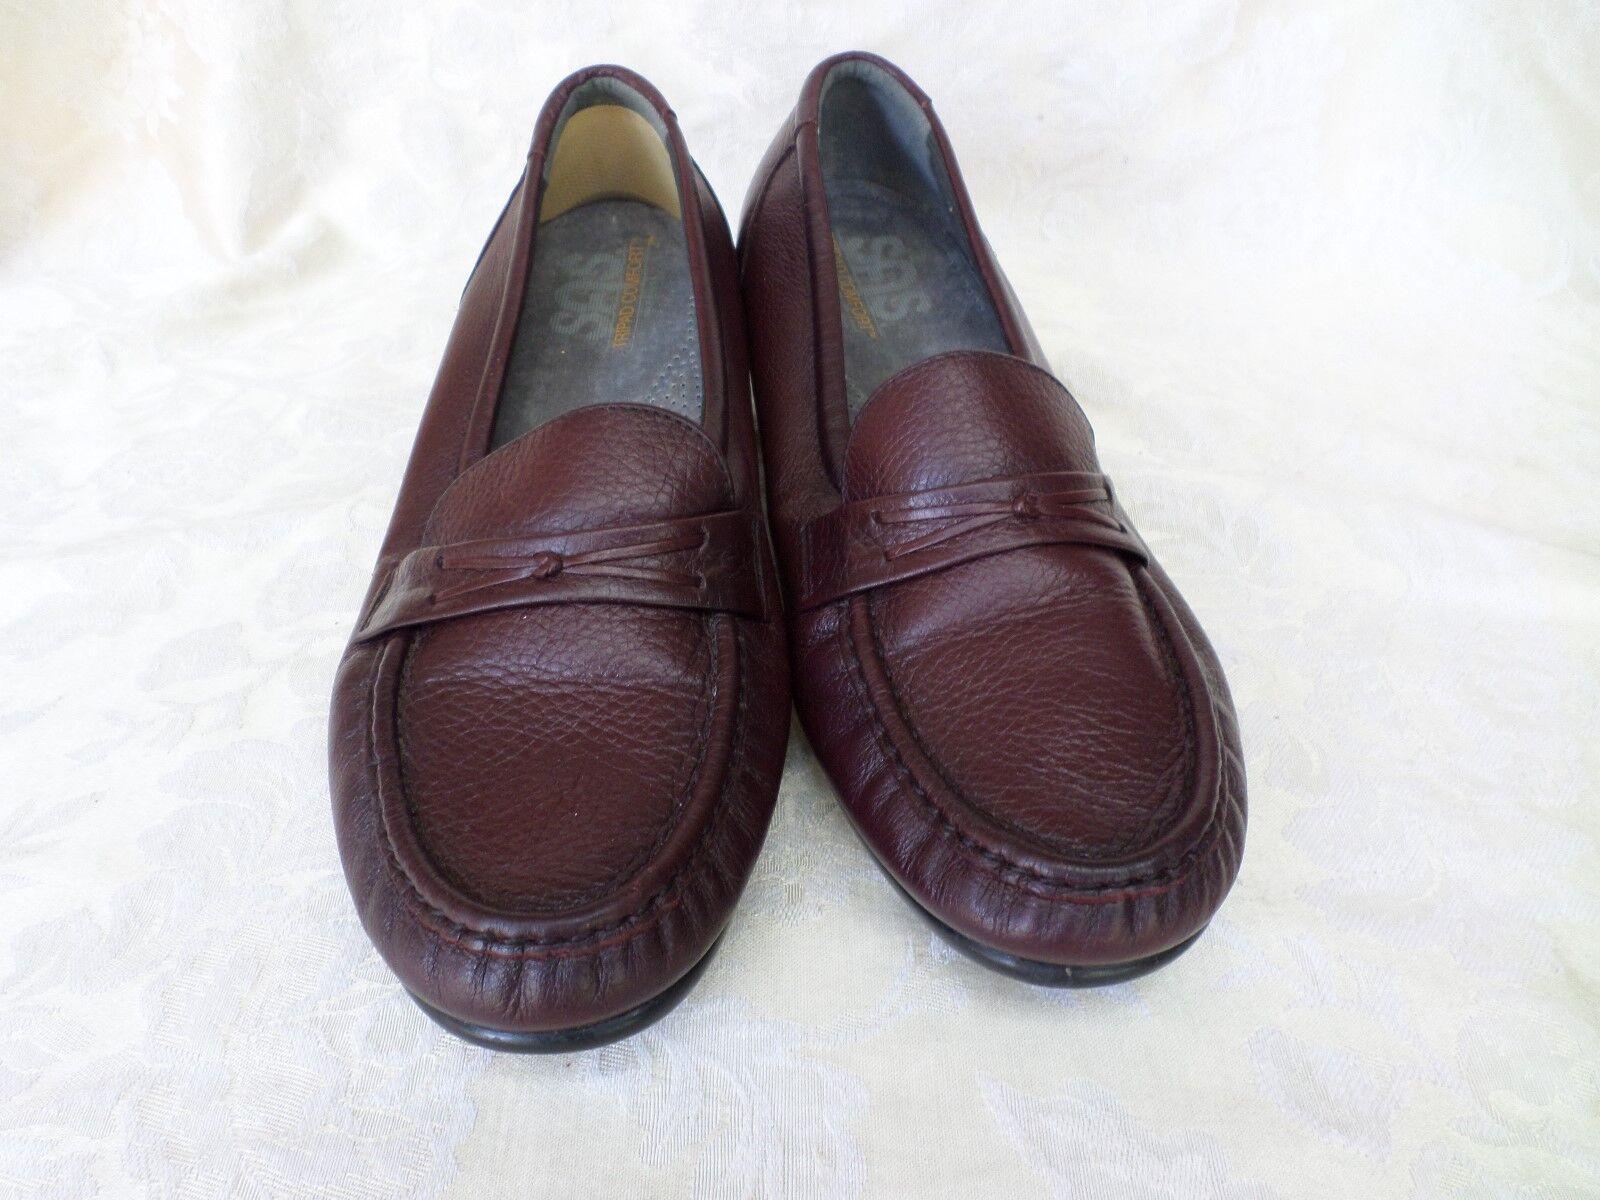 SAS Dark Brown Leather Penny Loafer Low Wedge Heel 10.5 WIDE